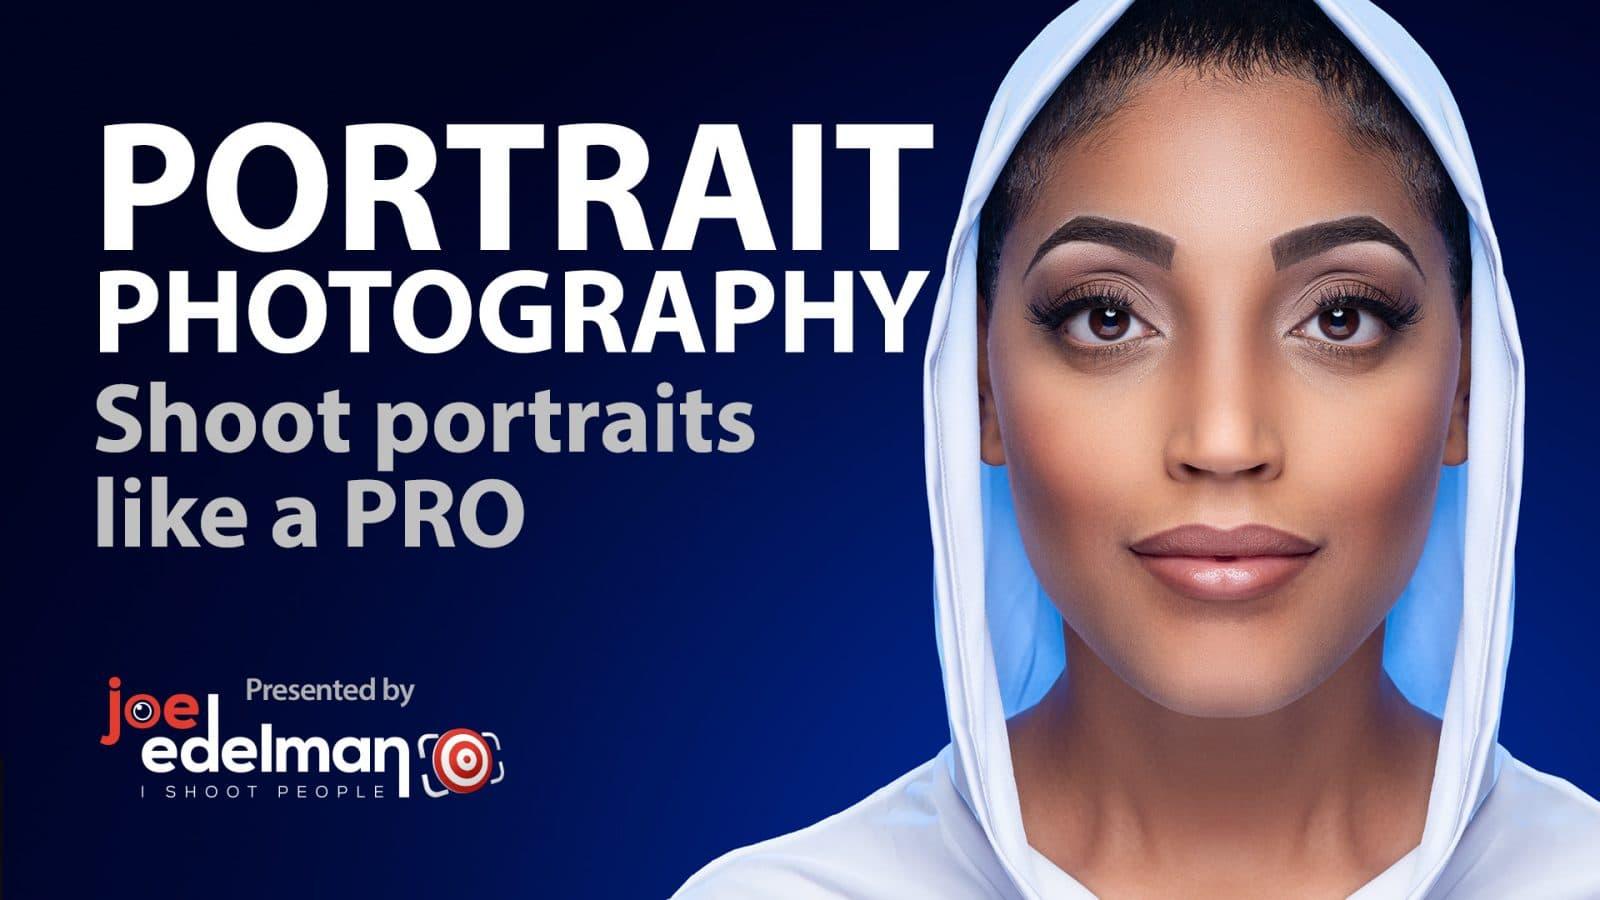 Portrait Photography — Learn to shoot portraits like a PRO